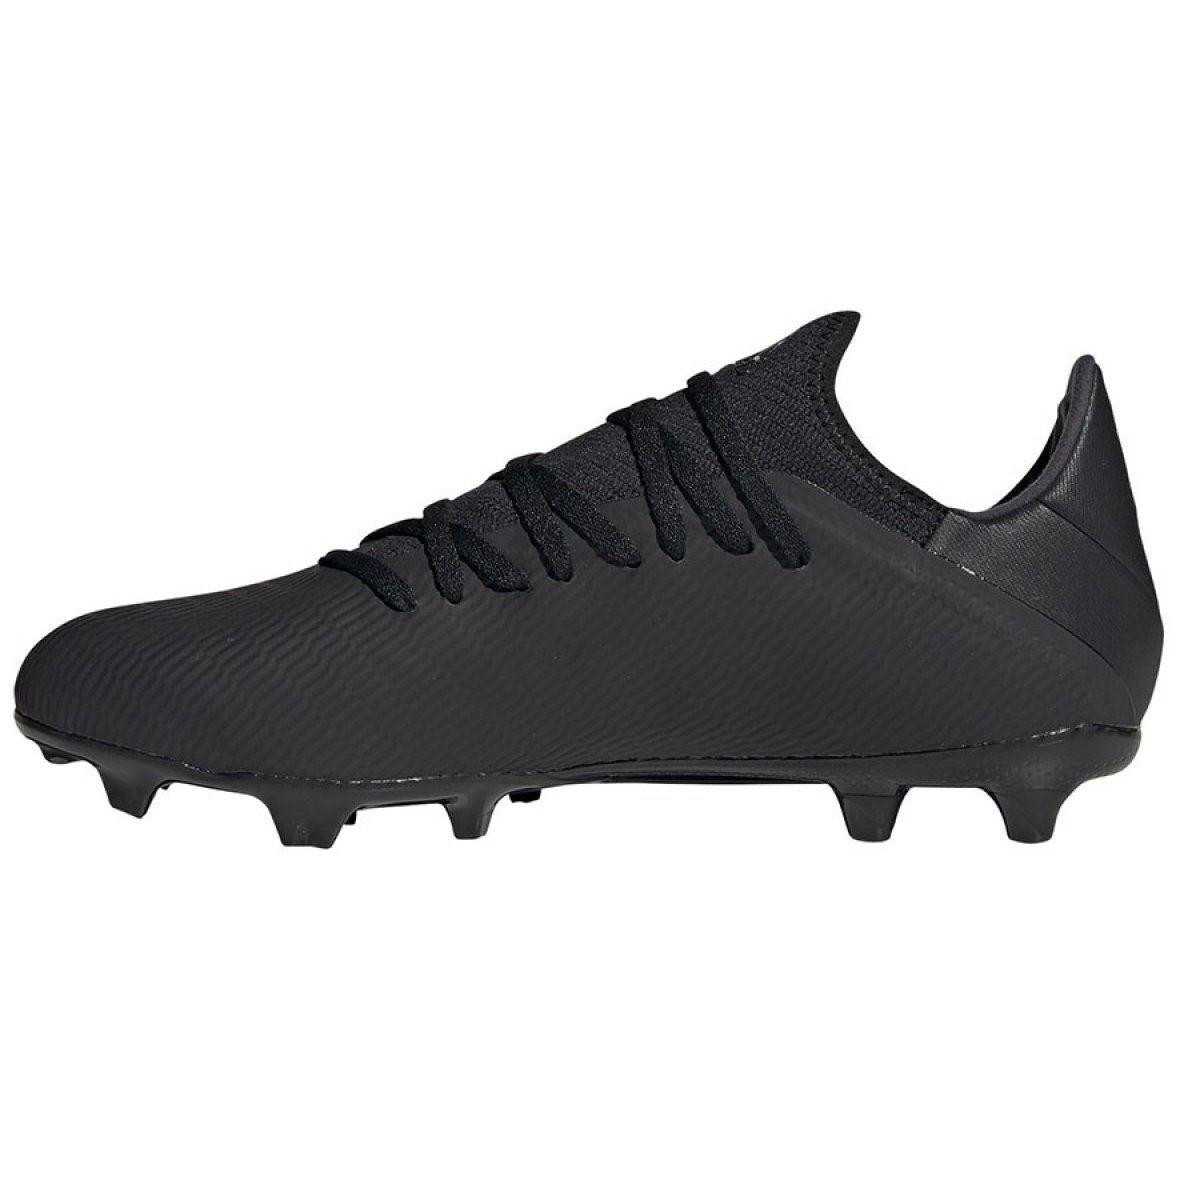 Buty Pilkarskie Adidas X 19 3 Fg M F35381 Czarne Czarne Football Boots Football Shoes Boots